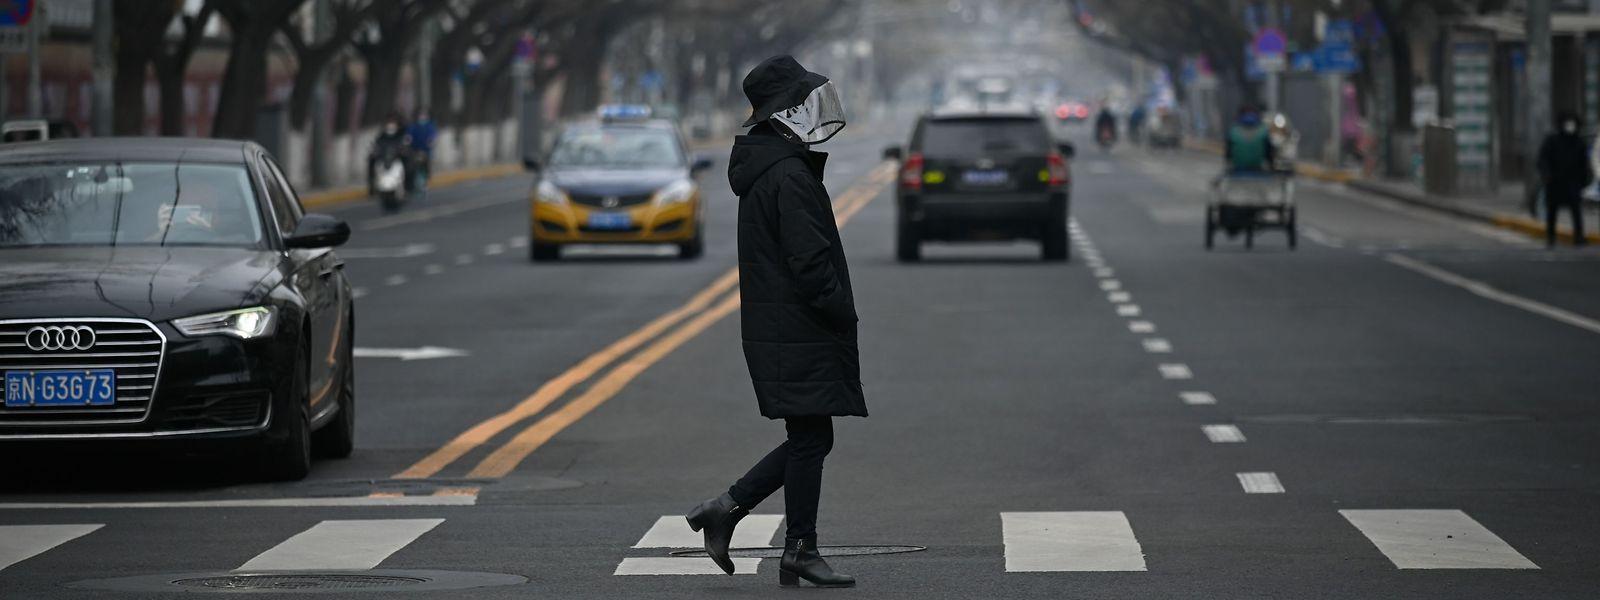 Corona-Virus: Lage in China bleibt angespannt